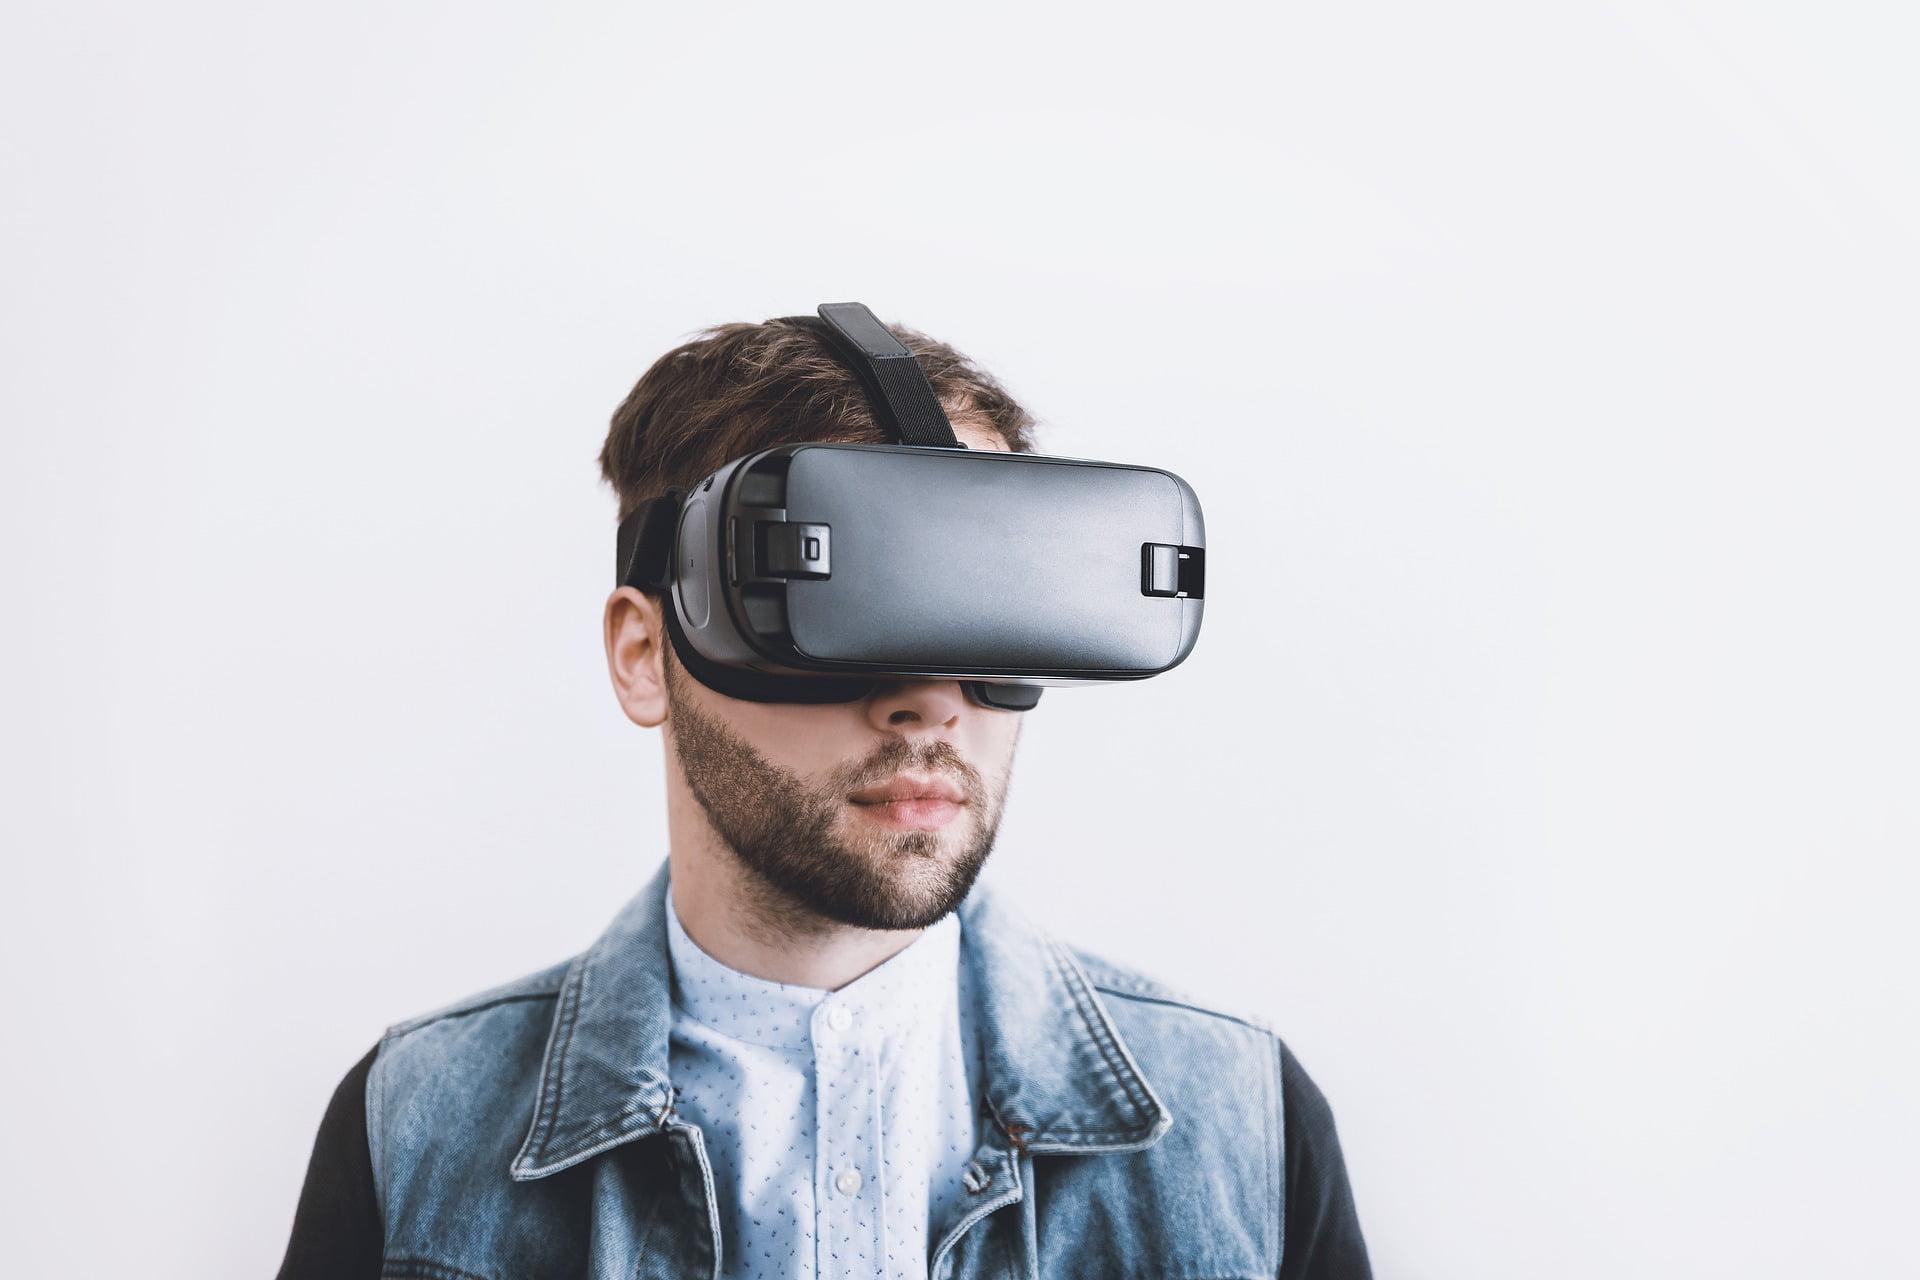 Gafas de realidad aumentada. 3D. Oculus